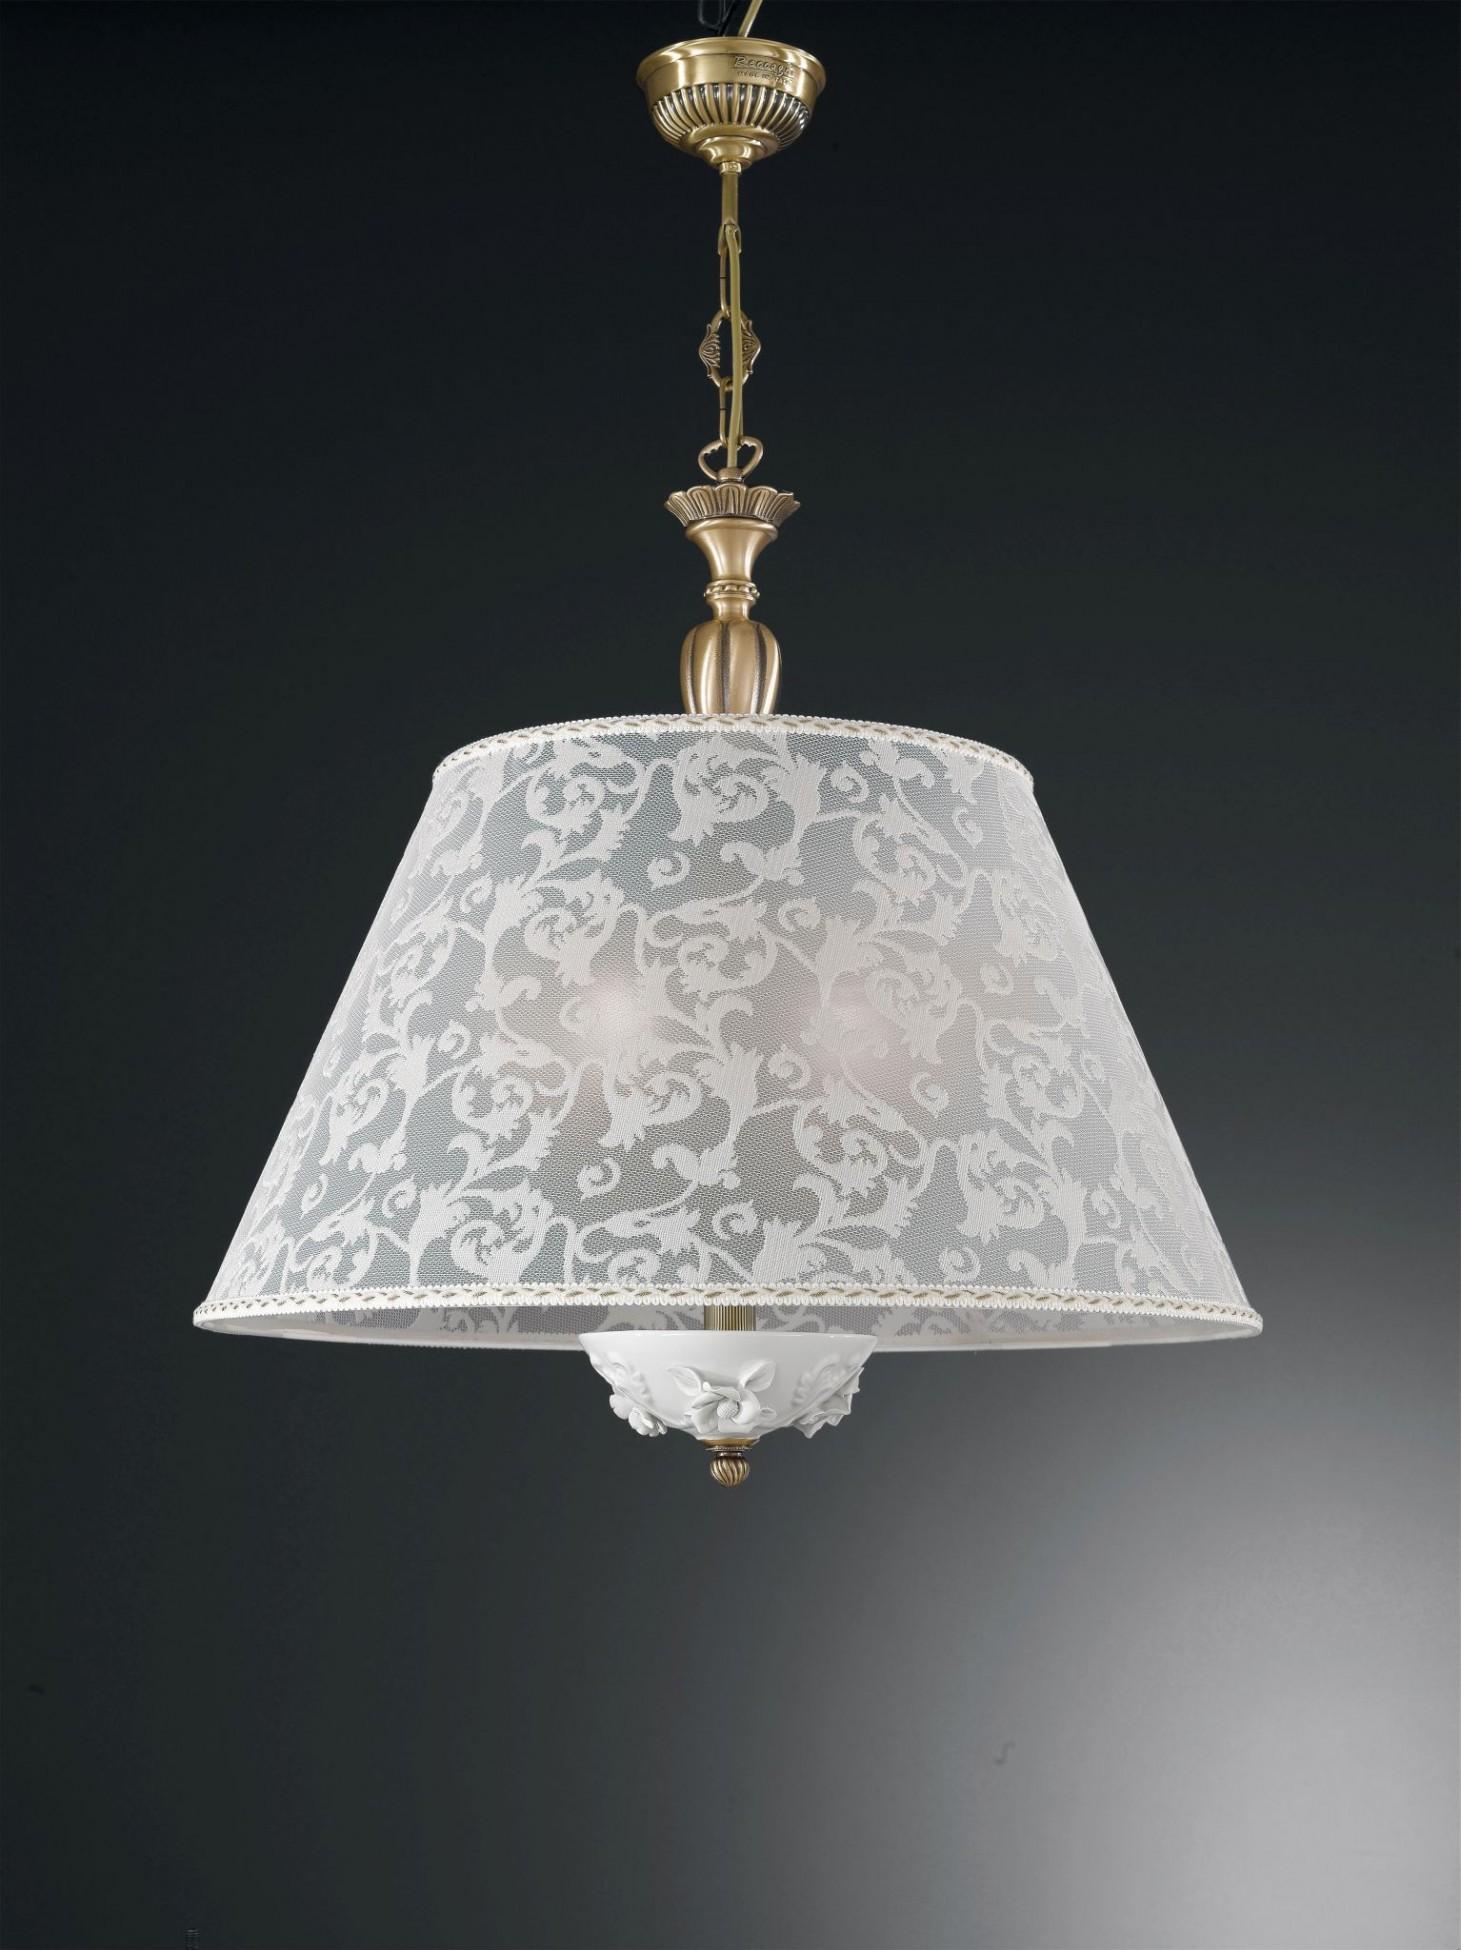 5 lights brass and white porcelain pendant lamp with lamp shade 60 5 lights brass and white porcelain pendant lamp with lamp shade 60 cm aloadofball Choice Image